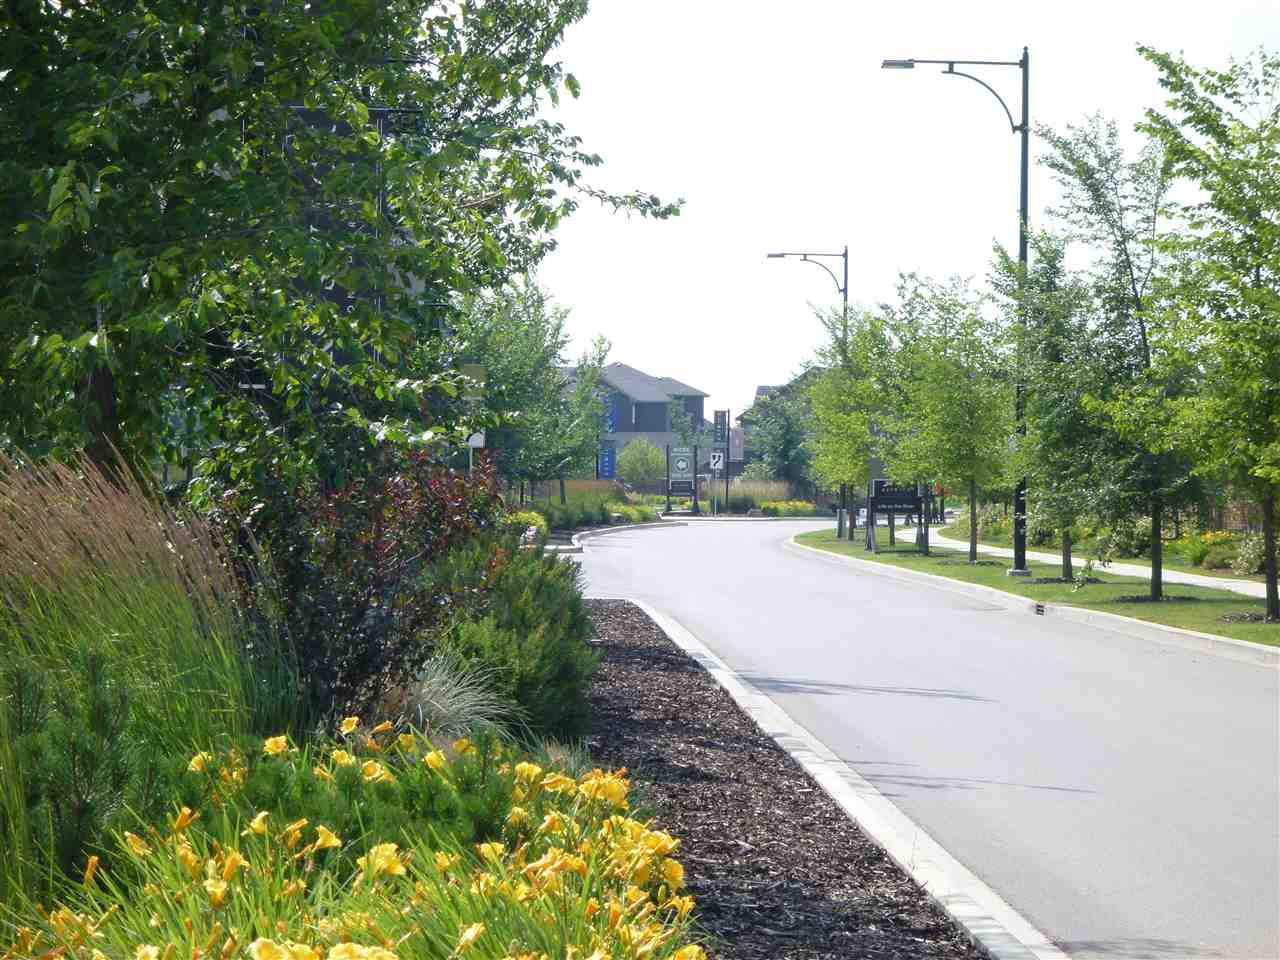 Main Photo: 3080 KESWICK Way in Edmonton: Zone 56 Attached Home for sale : MLS®# E4189325